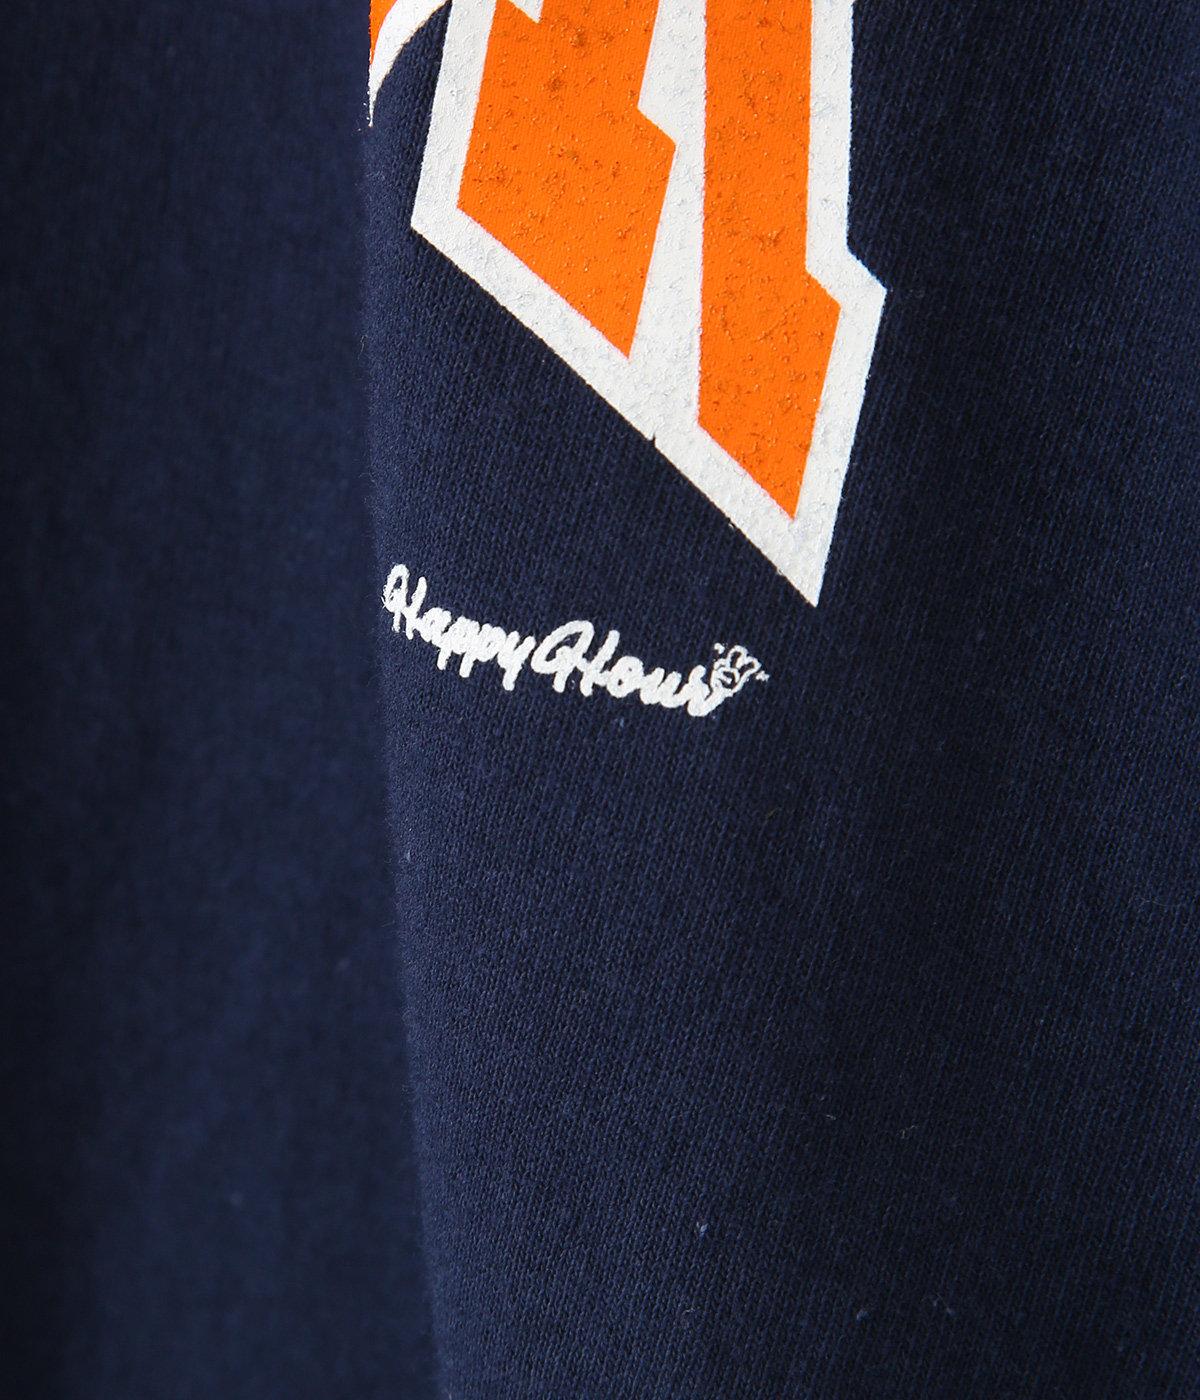 HAPPY HOUR (LS) shirt